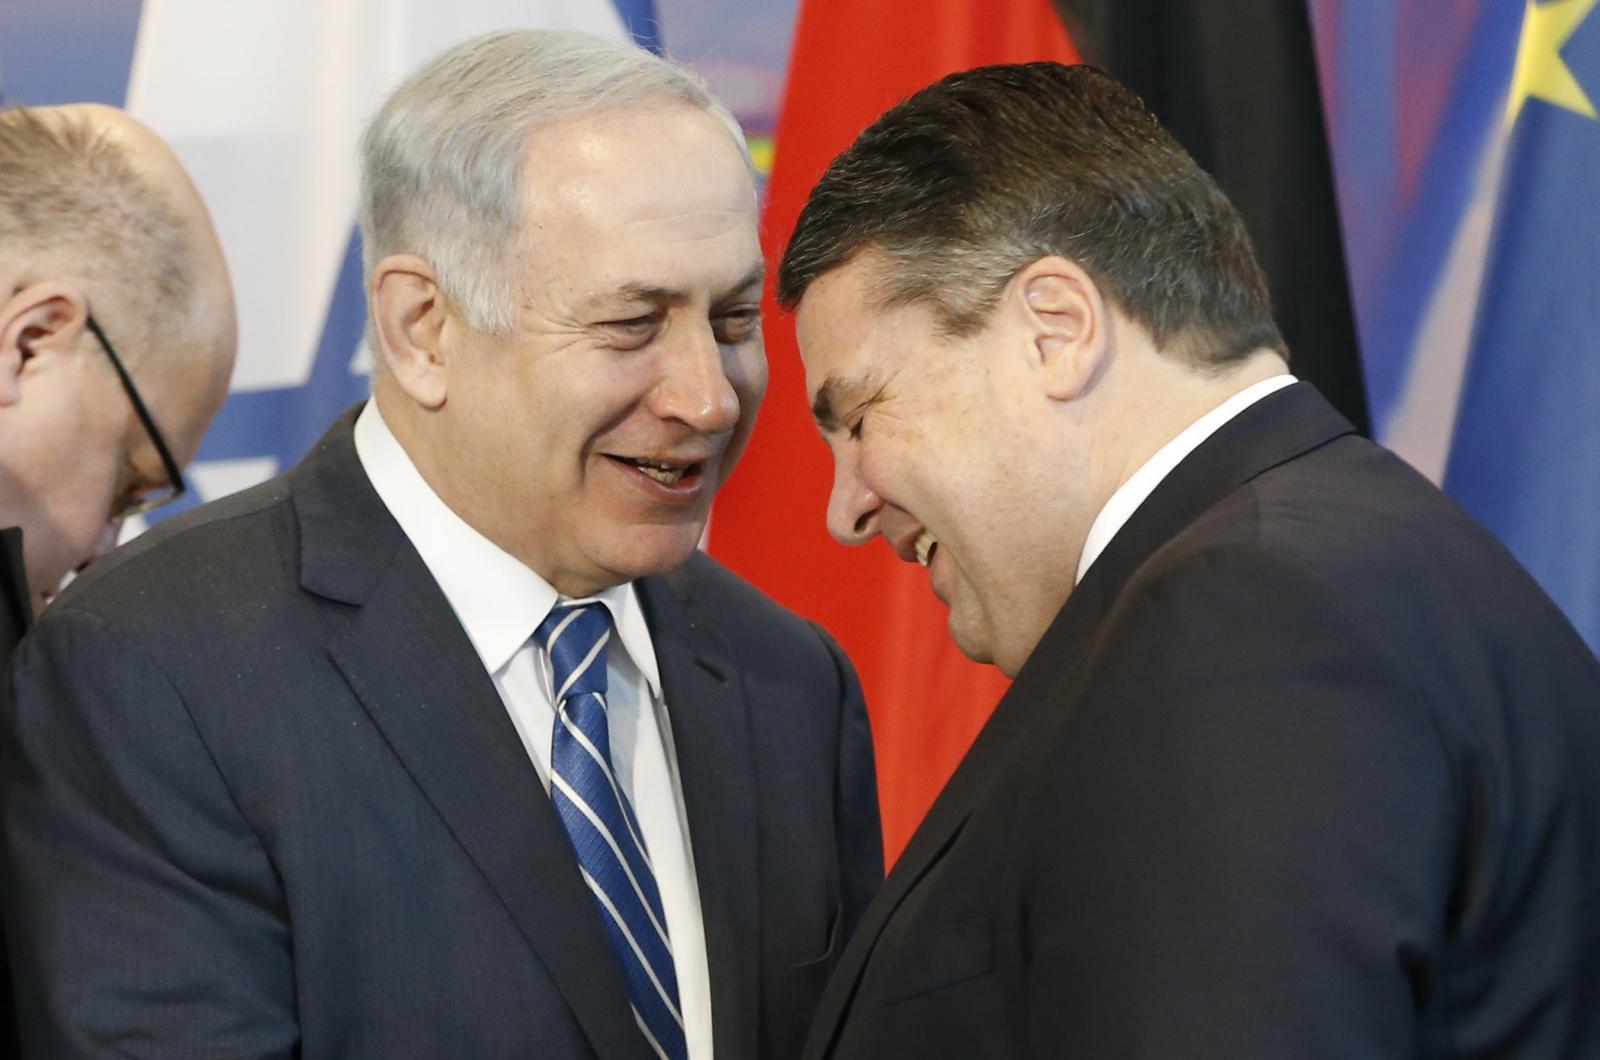 Netanyahu Gabriel